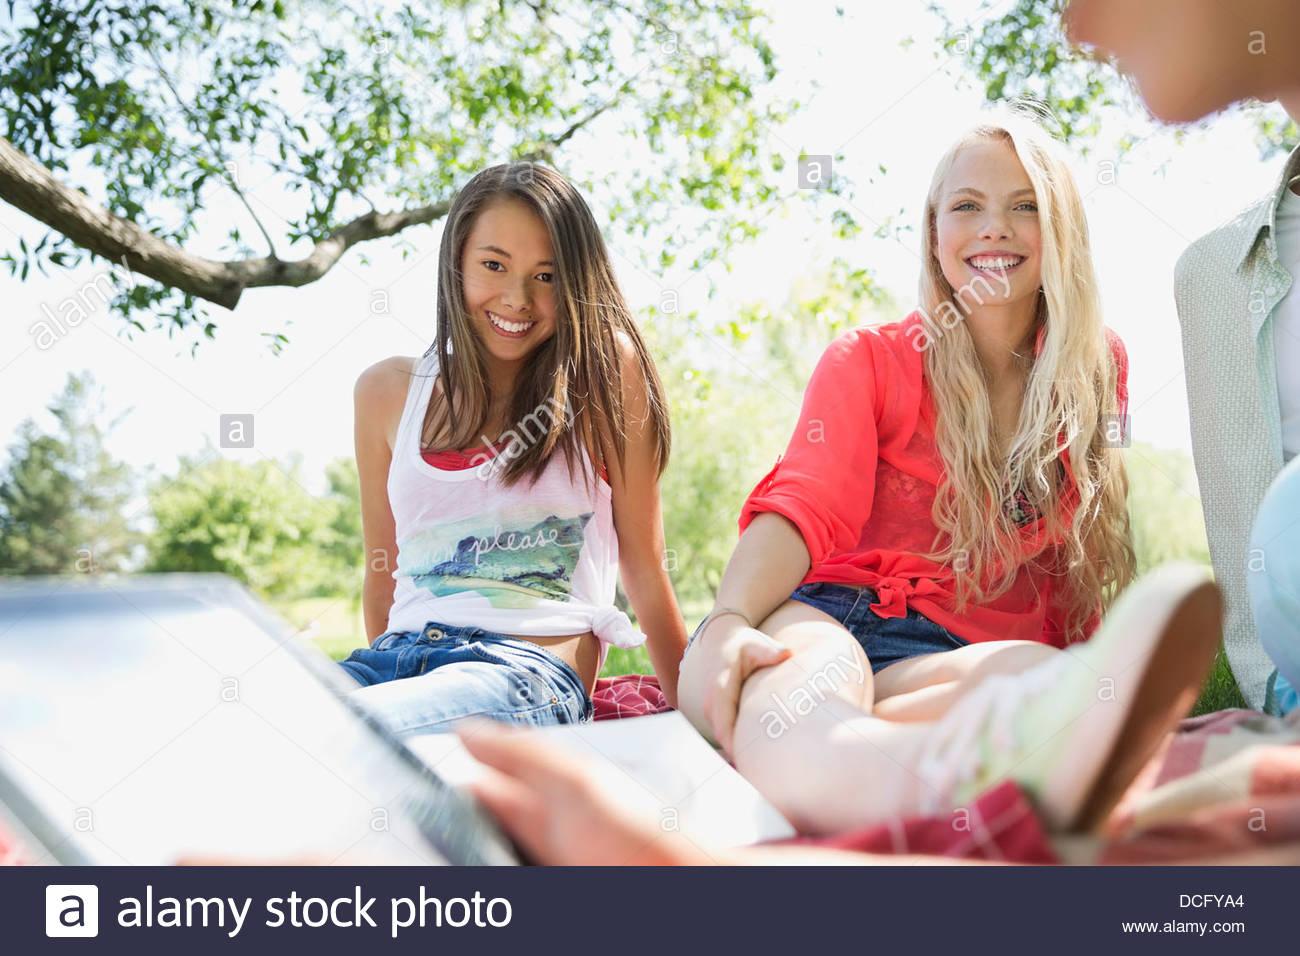 Les adolescents traînant ensemble Banque D'Images